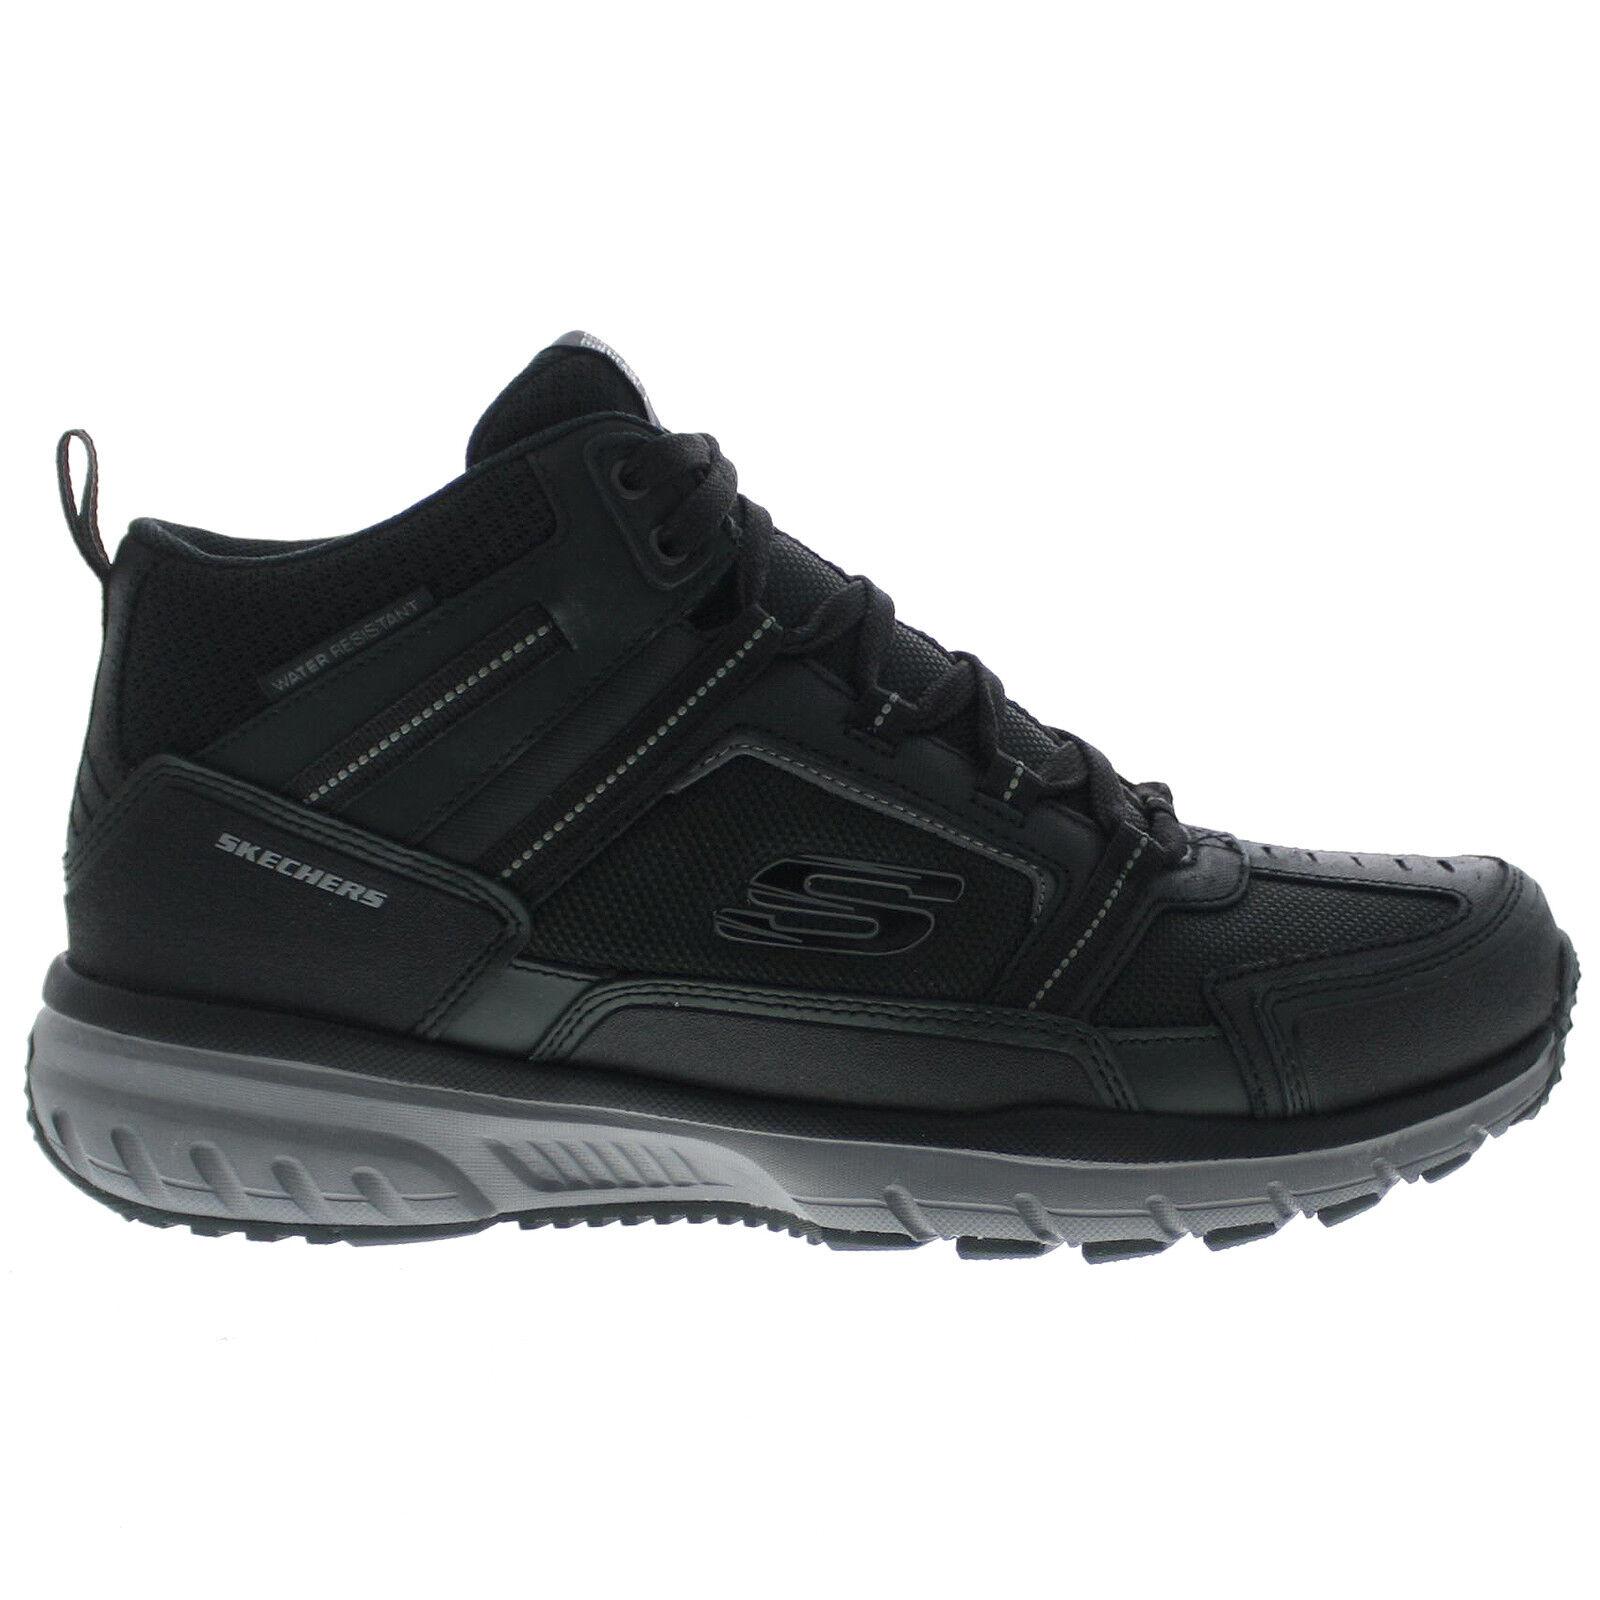 Skechers Geo Trek Hiking BKGY 51562 #BR Shoes Men's